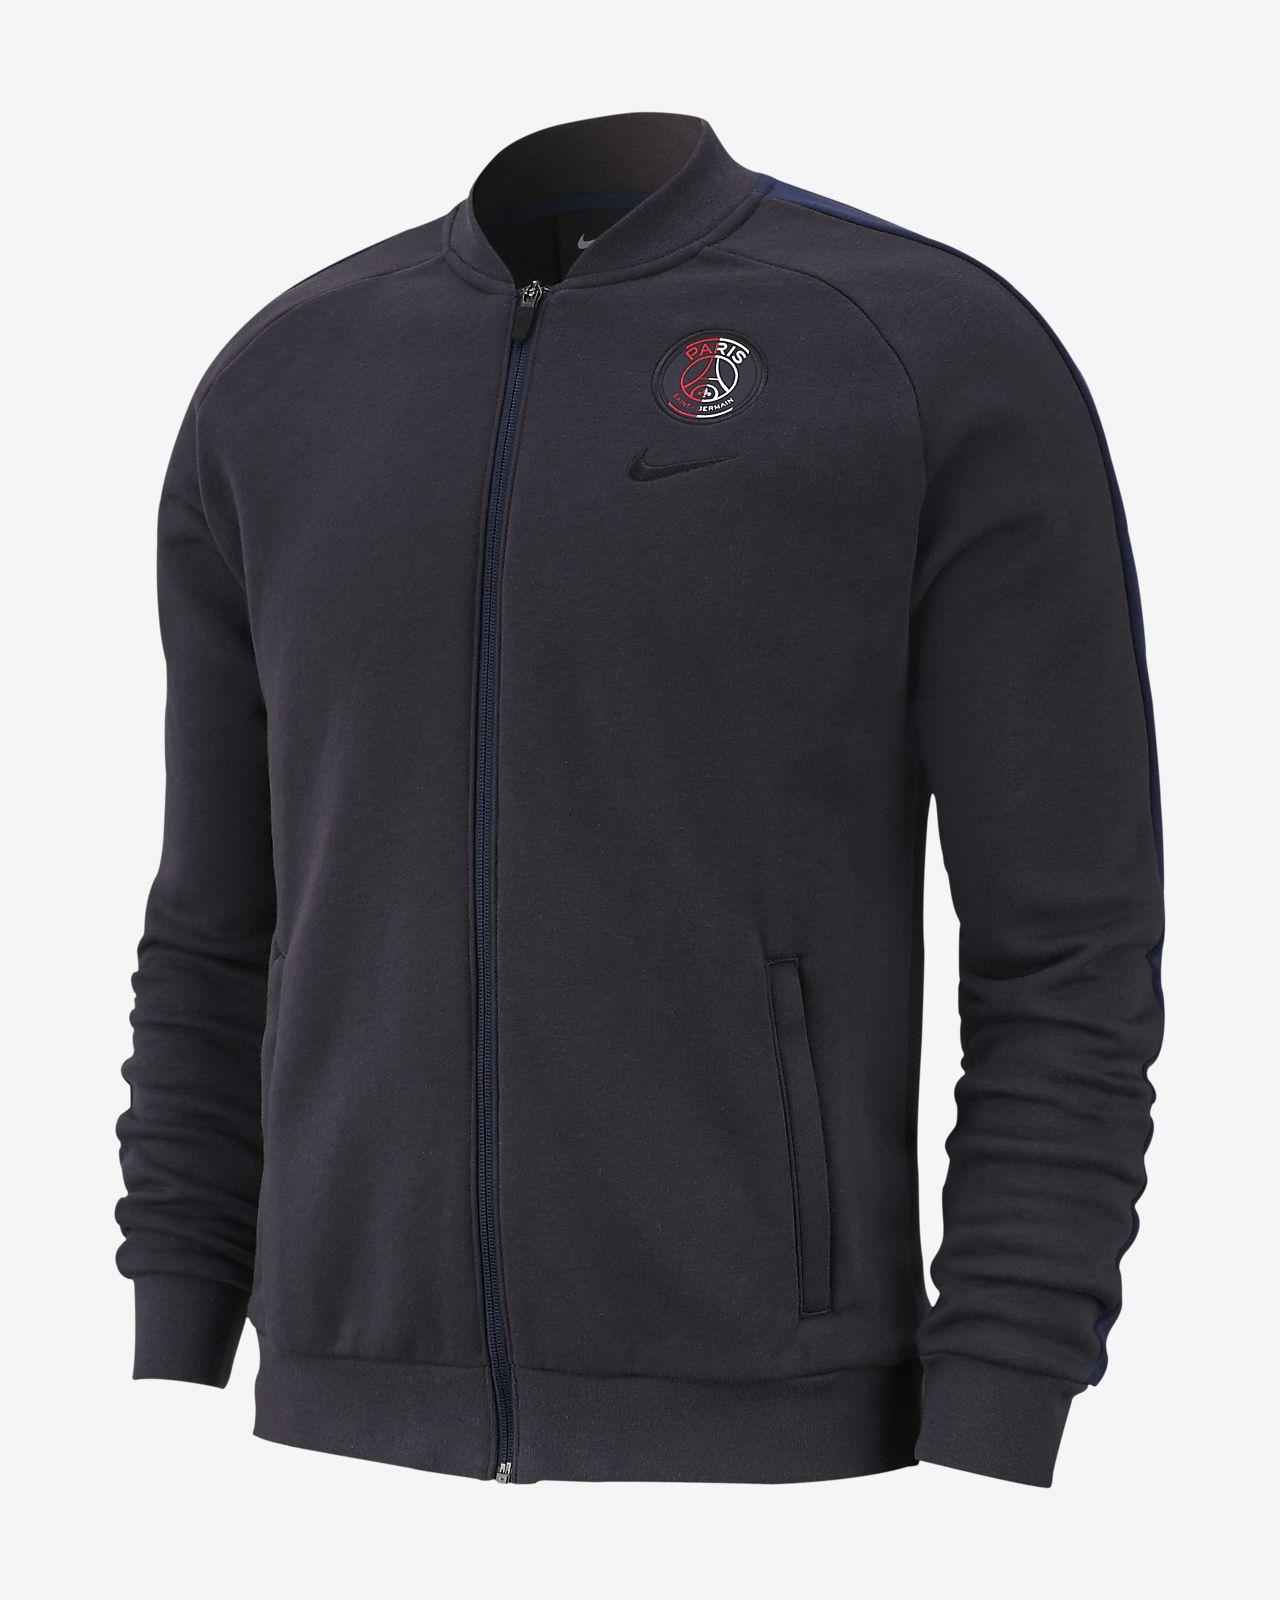 Paris Saint-Germain Men's Fleece Track Jacket